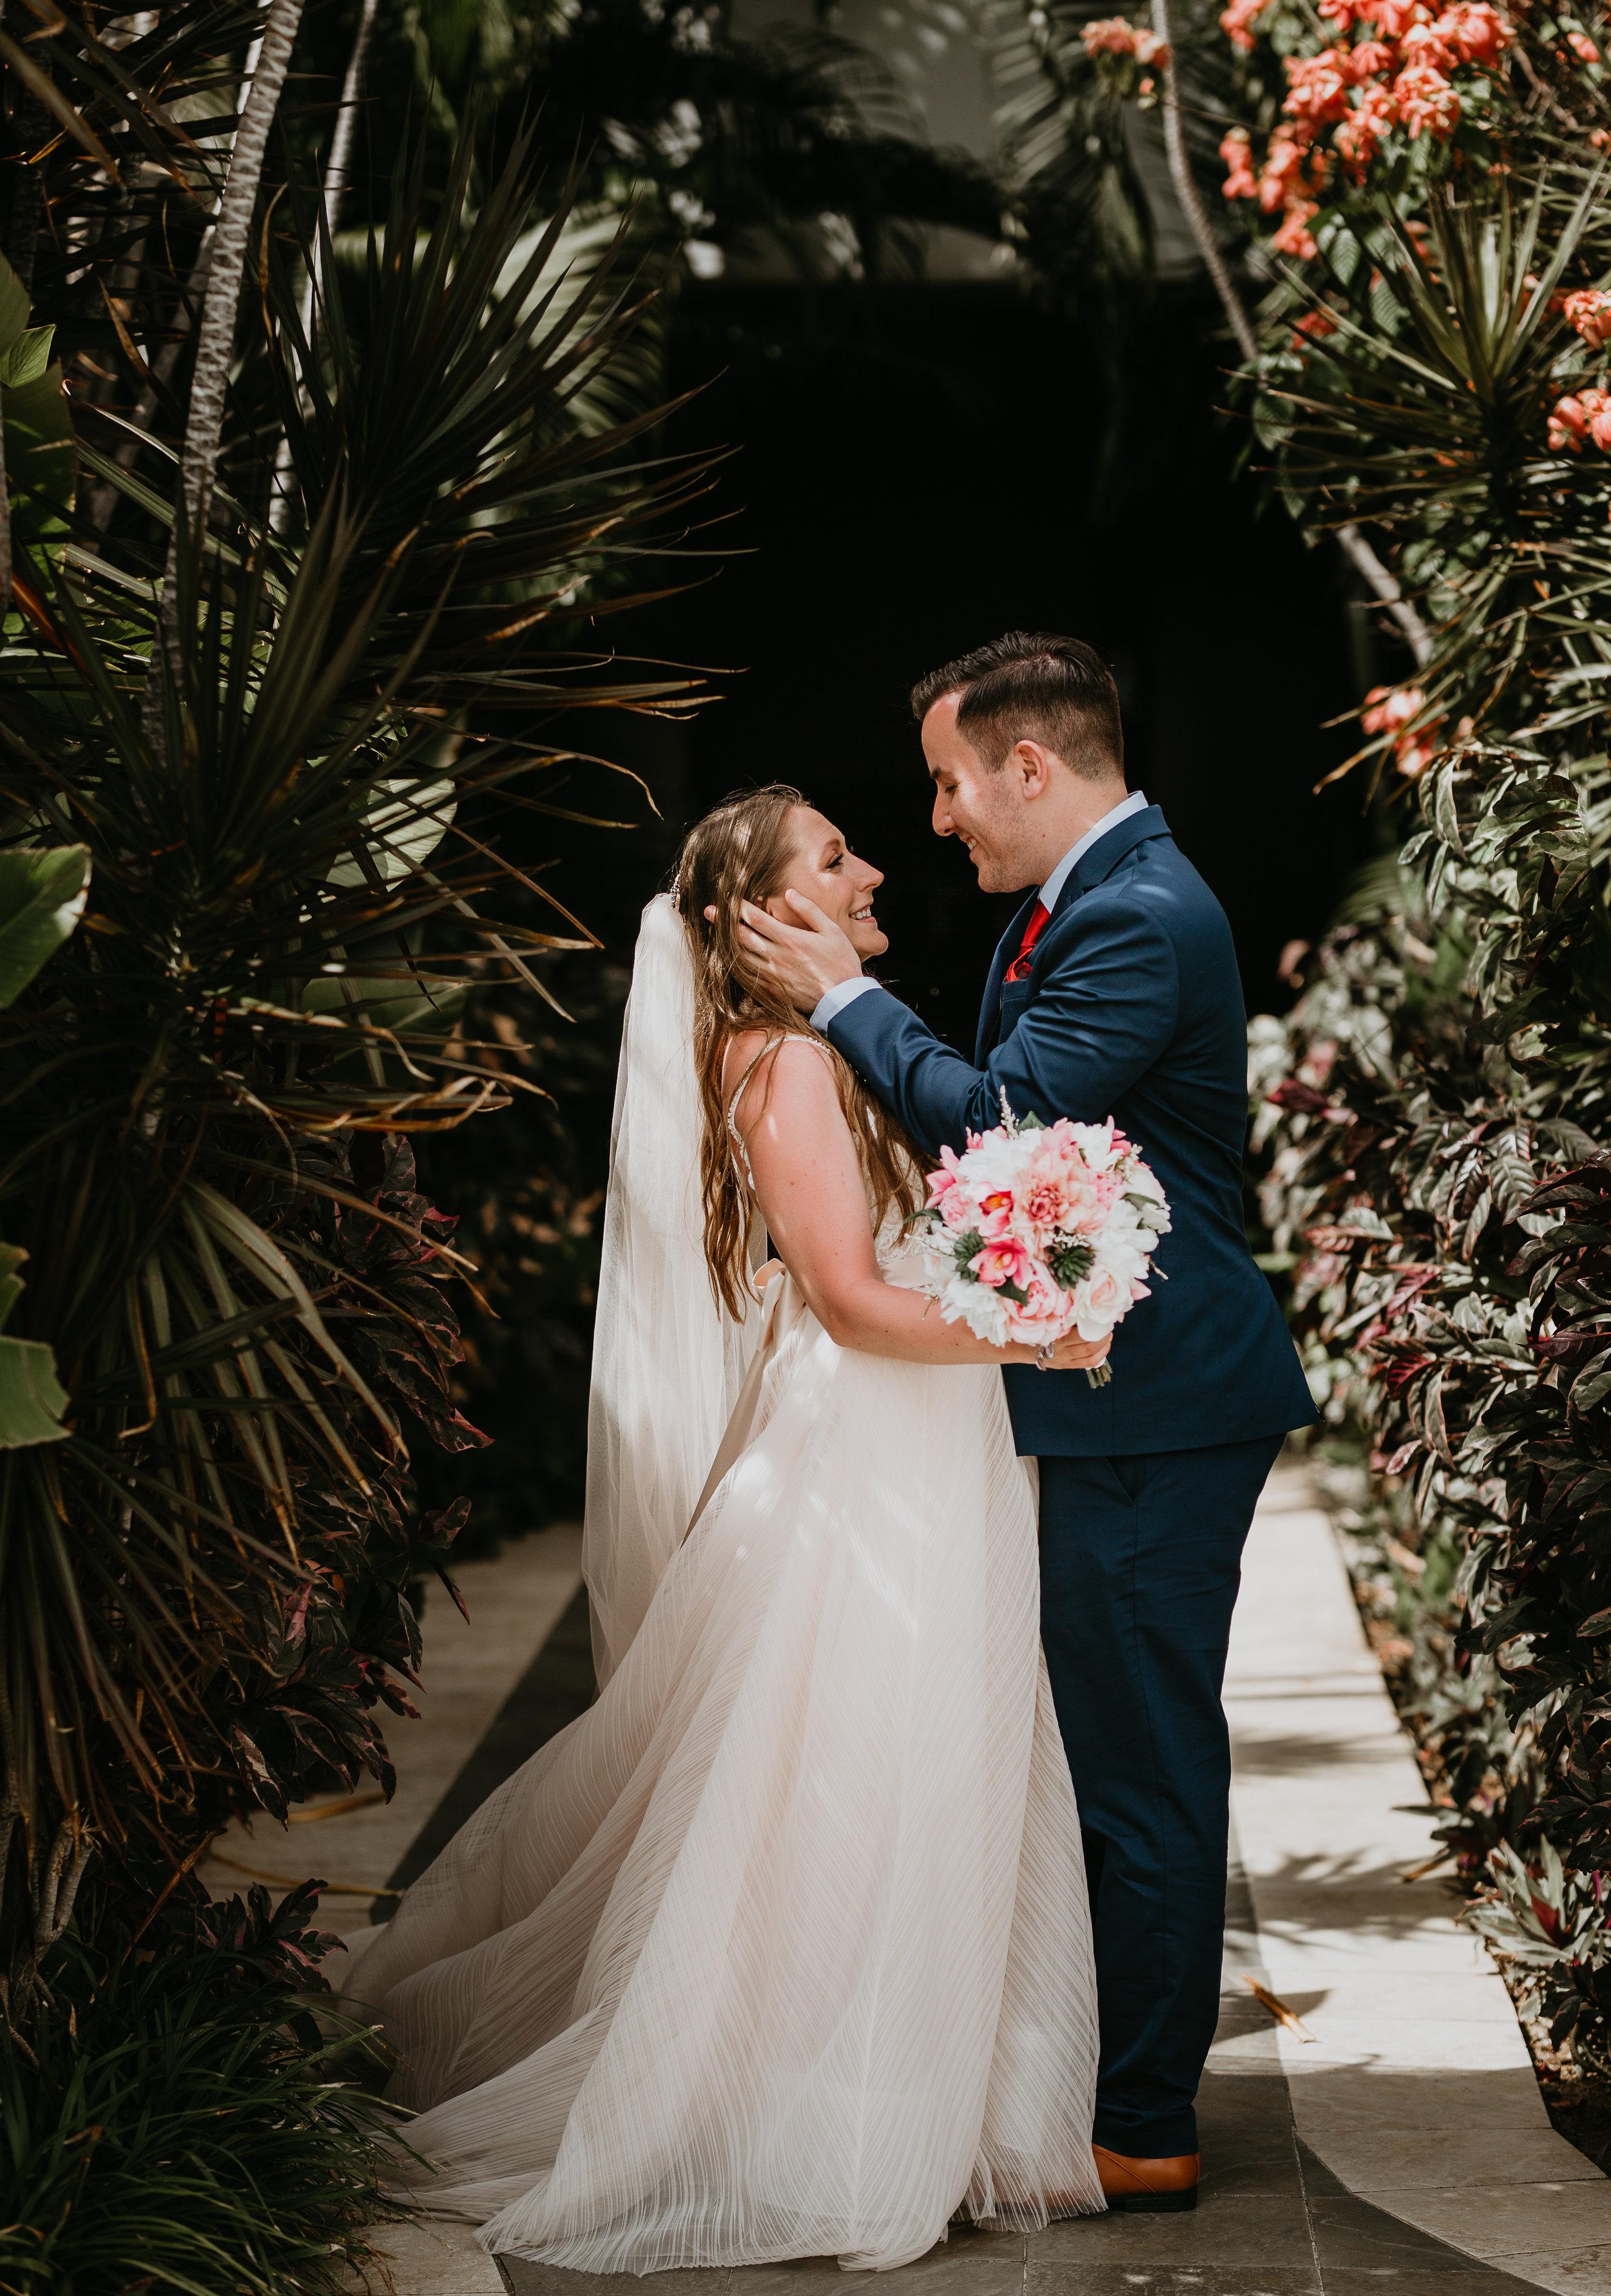 nicole-daacke-photography-destination-wedding-in-st-lucia-sandals-la-toc-intimate-island-wedding-carribean-elopement-photographer-chill-island-wedding-41.jpg